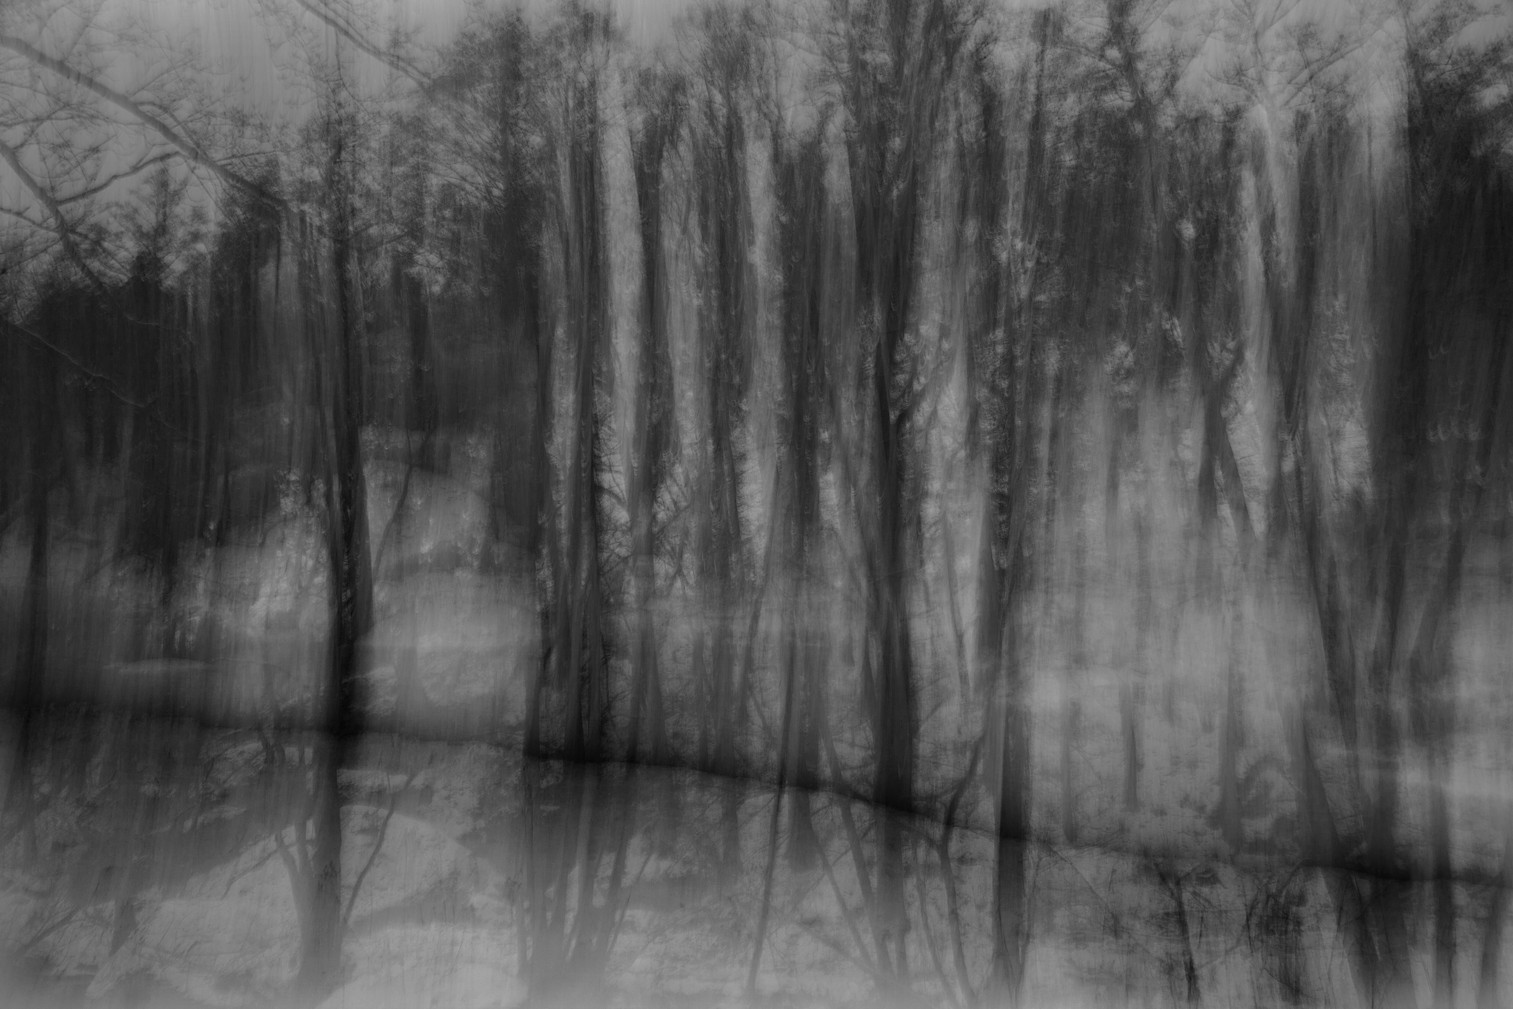 07_Hangwald (Schwarzer Fluss), 2013.jpg